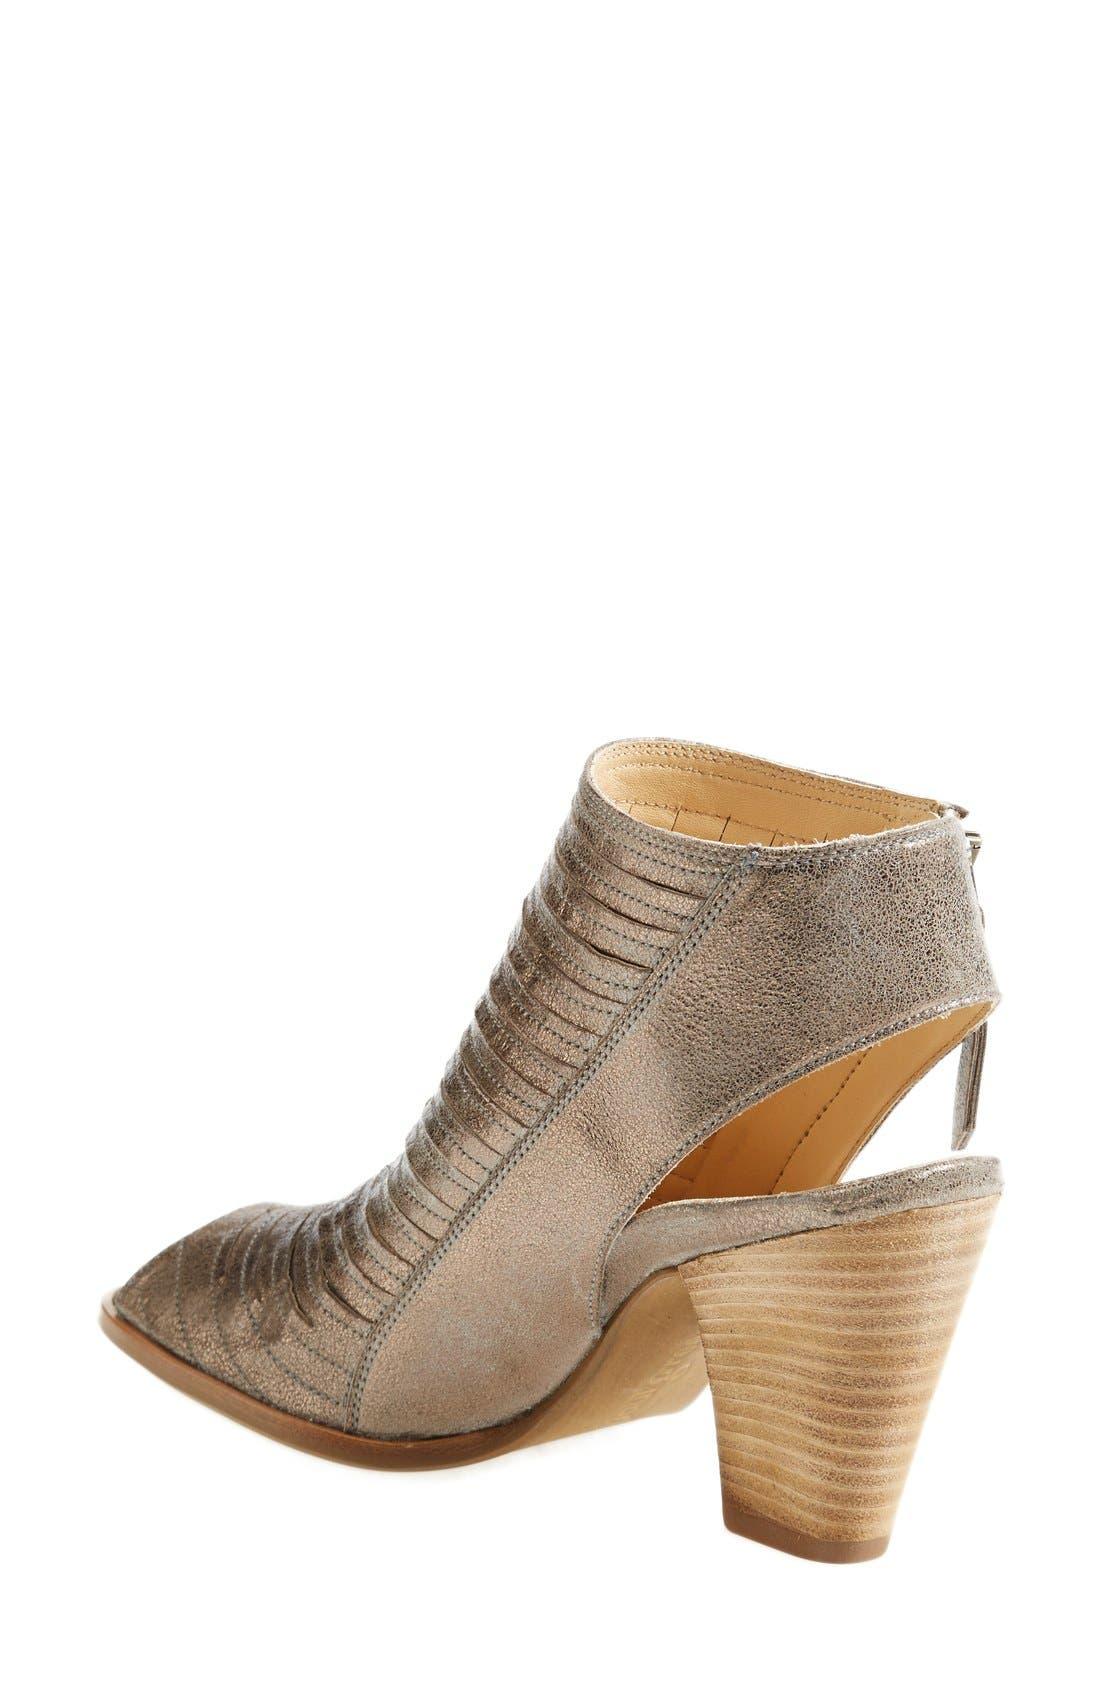 'Cayanne' Leather Peep Toe Sandal,                             Alternate thumbnail 26, color,